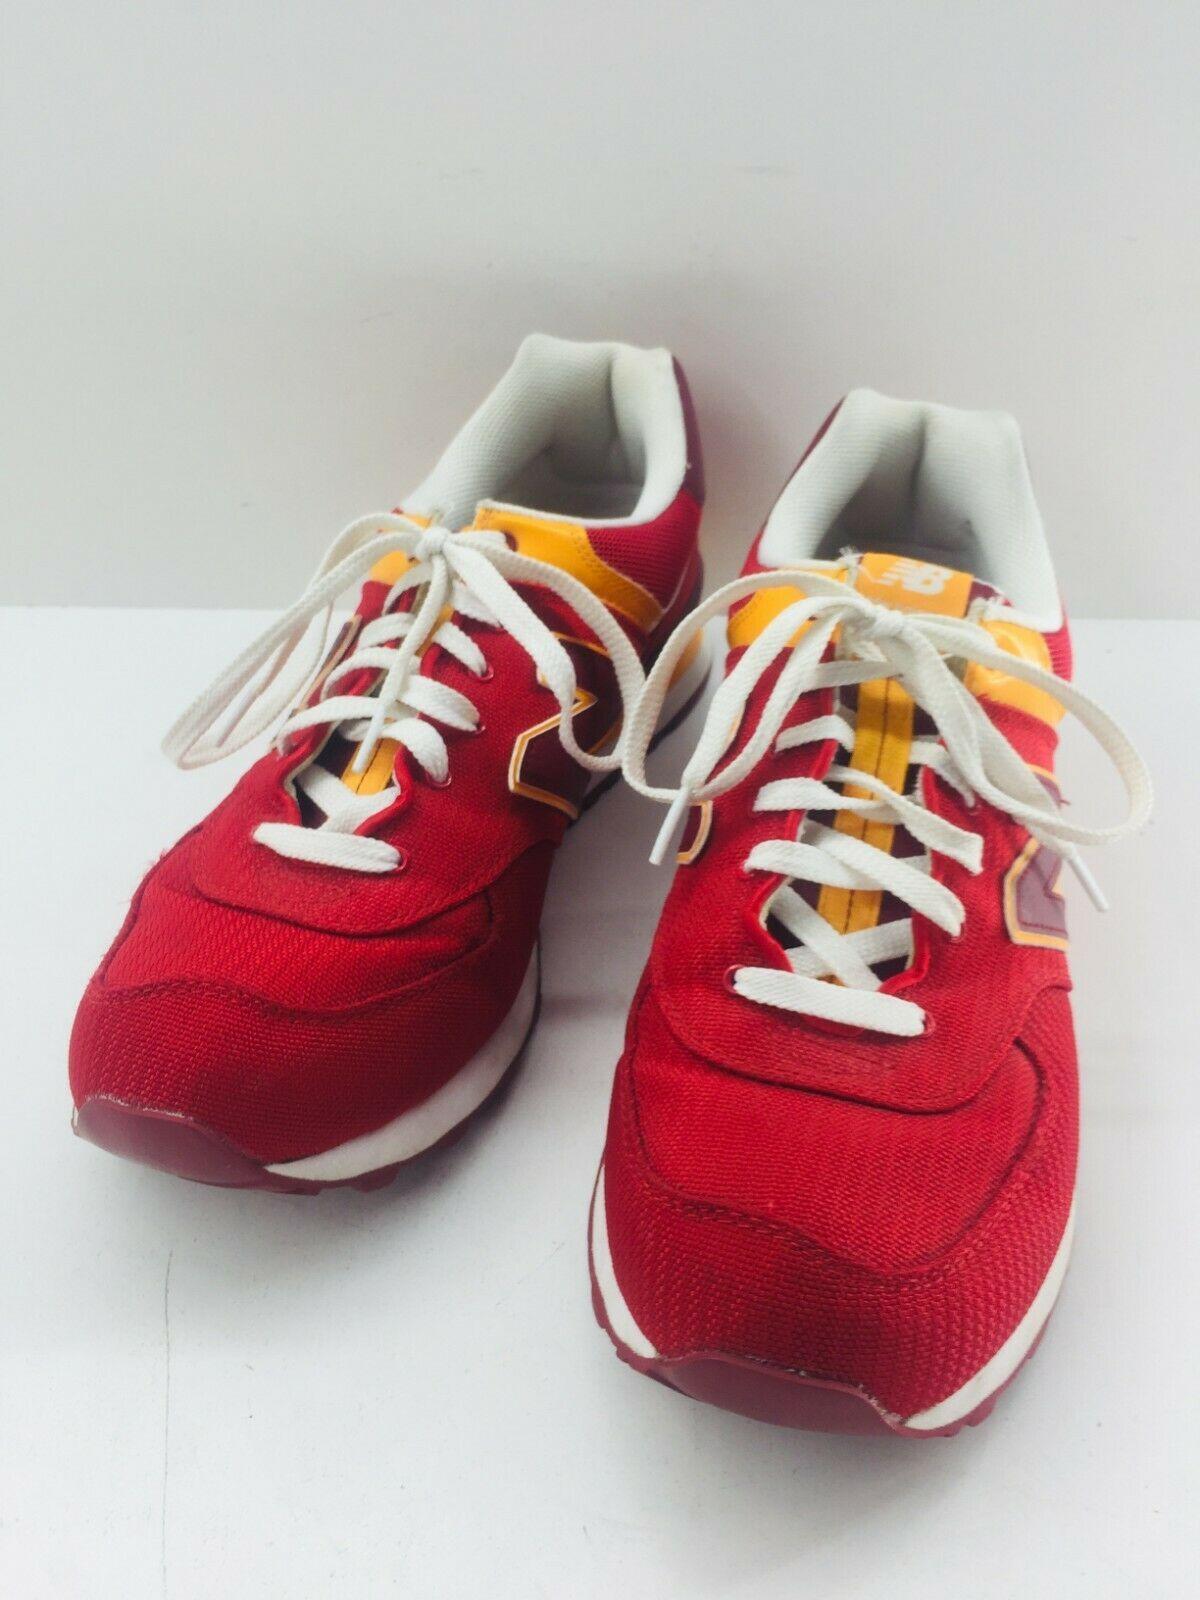 New Balance Athletic Sneaker Shoes Men's Sz 11.5 Red Orange ML574PPR  574 EUC image 5